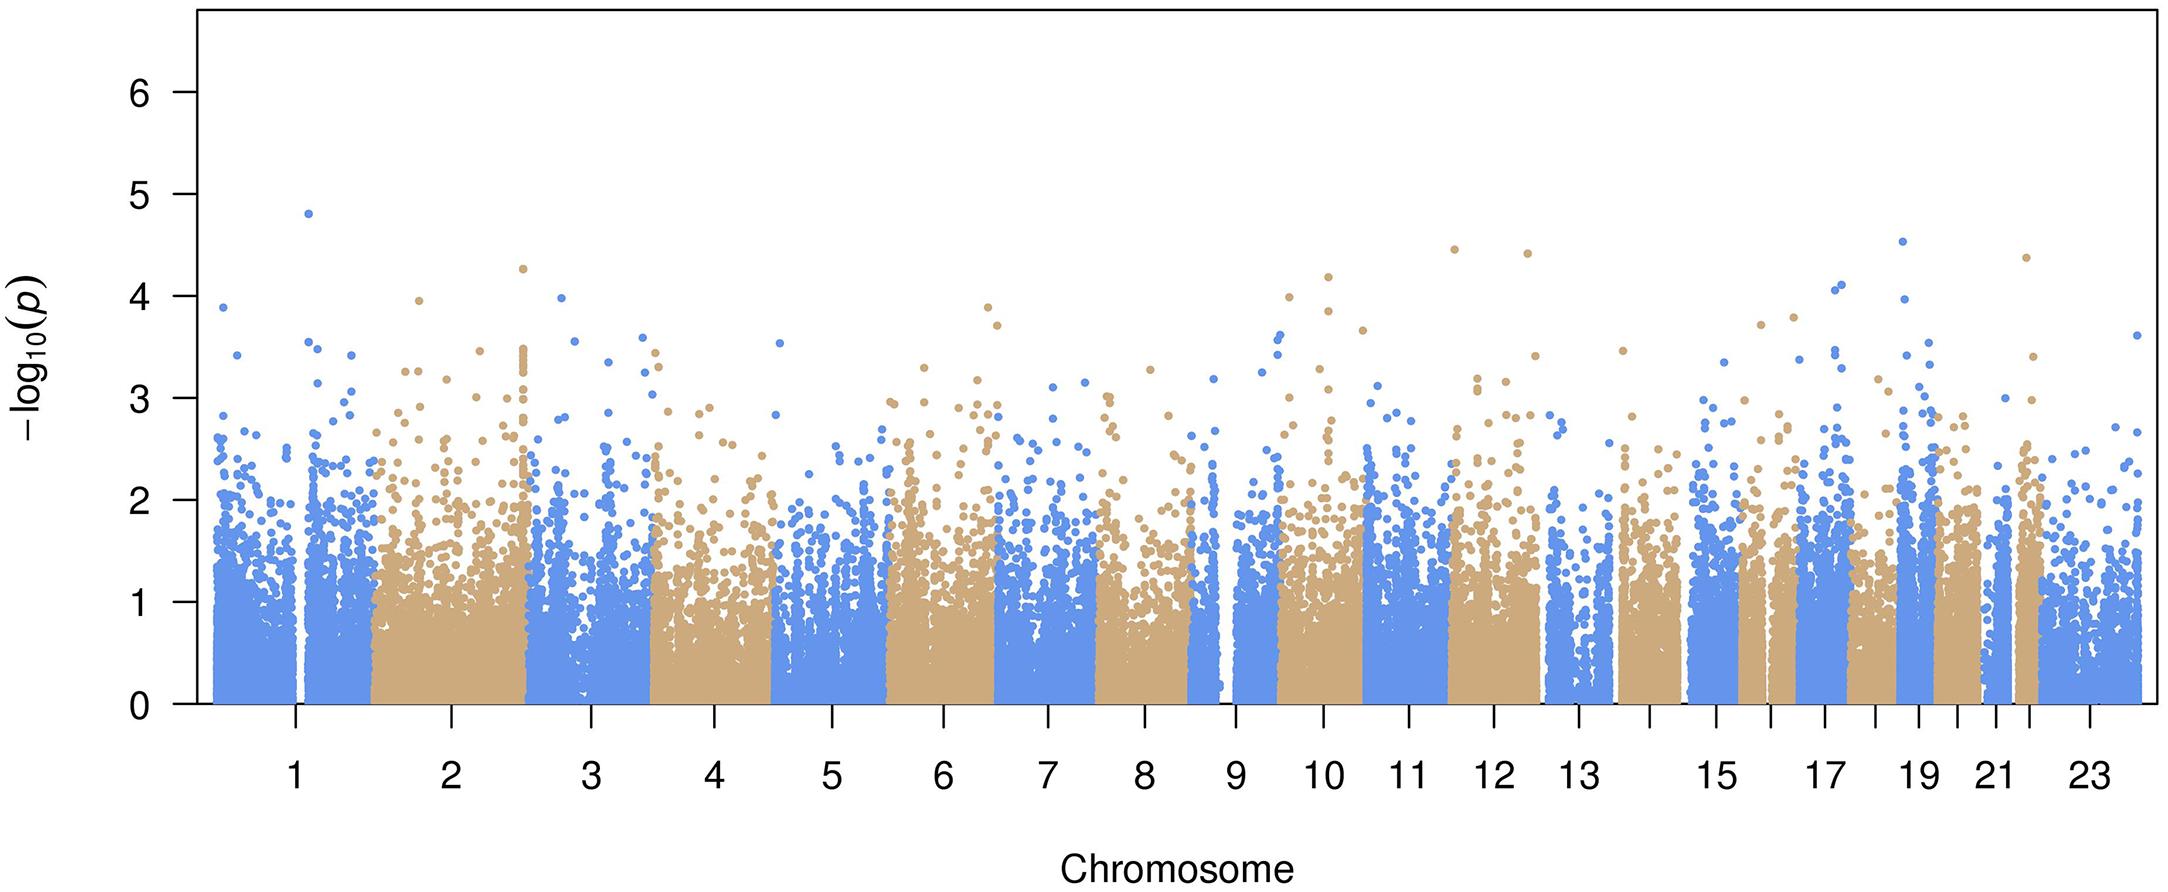 Manhattan plot of common variant associations with atrial fibrillation.